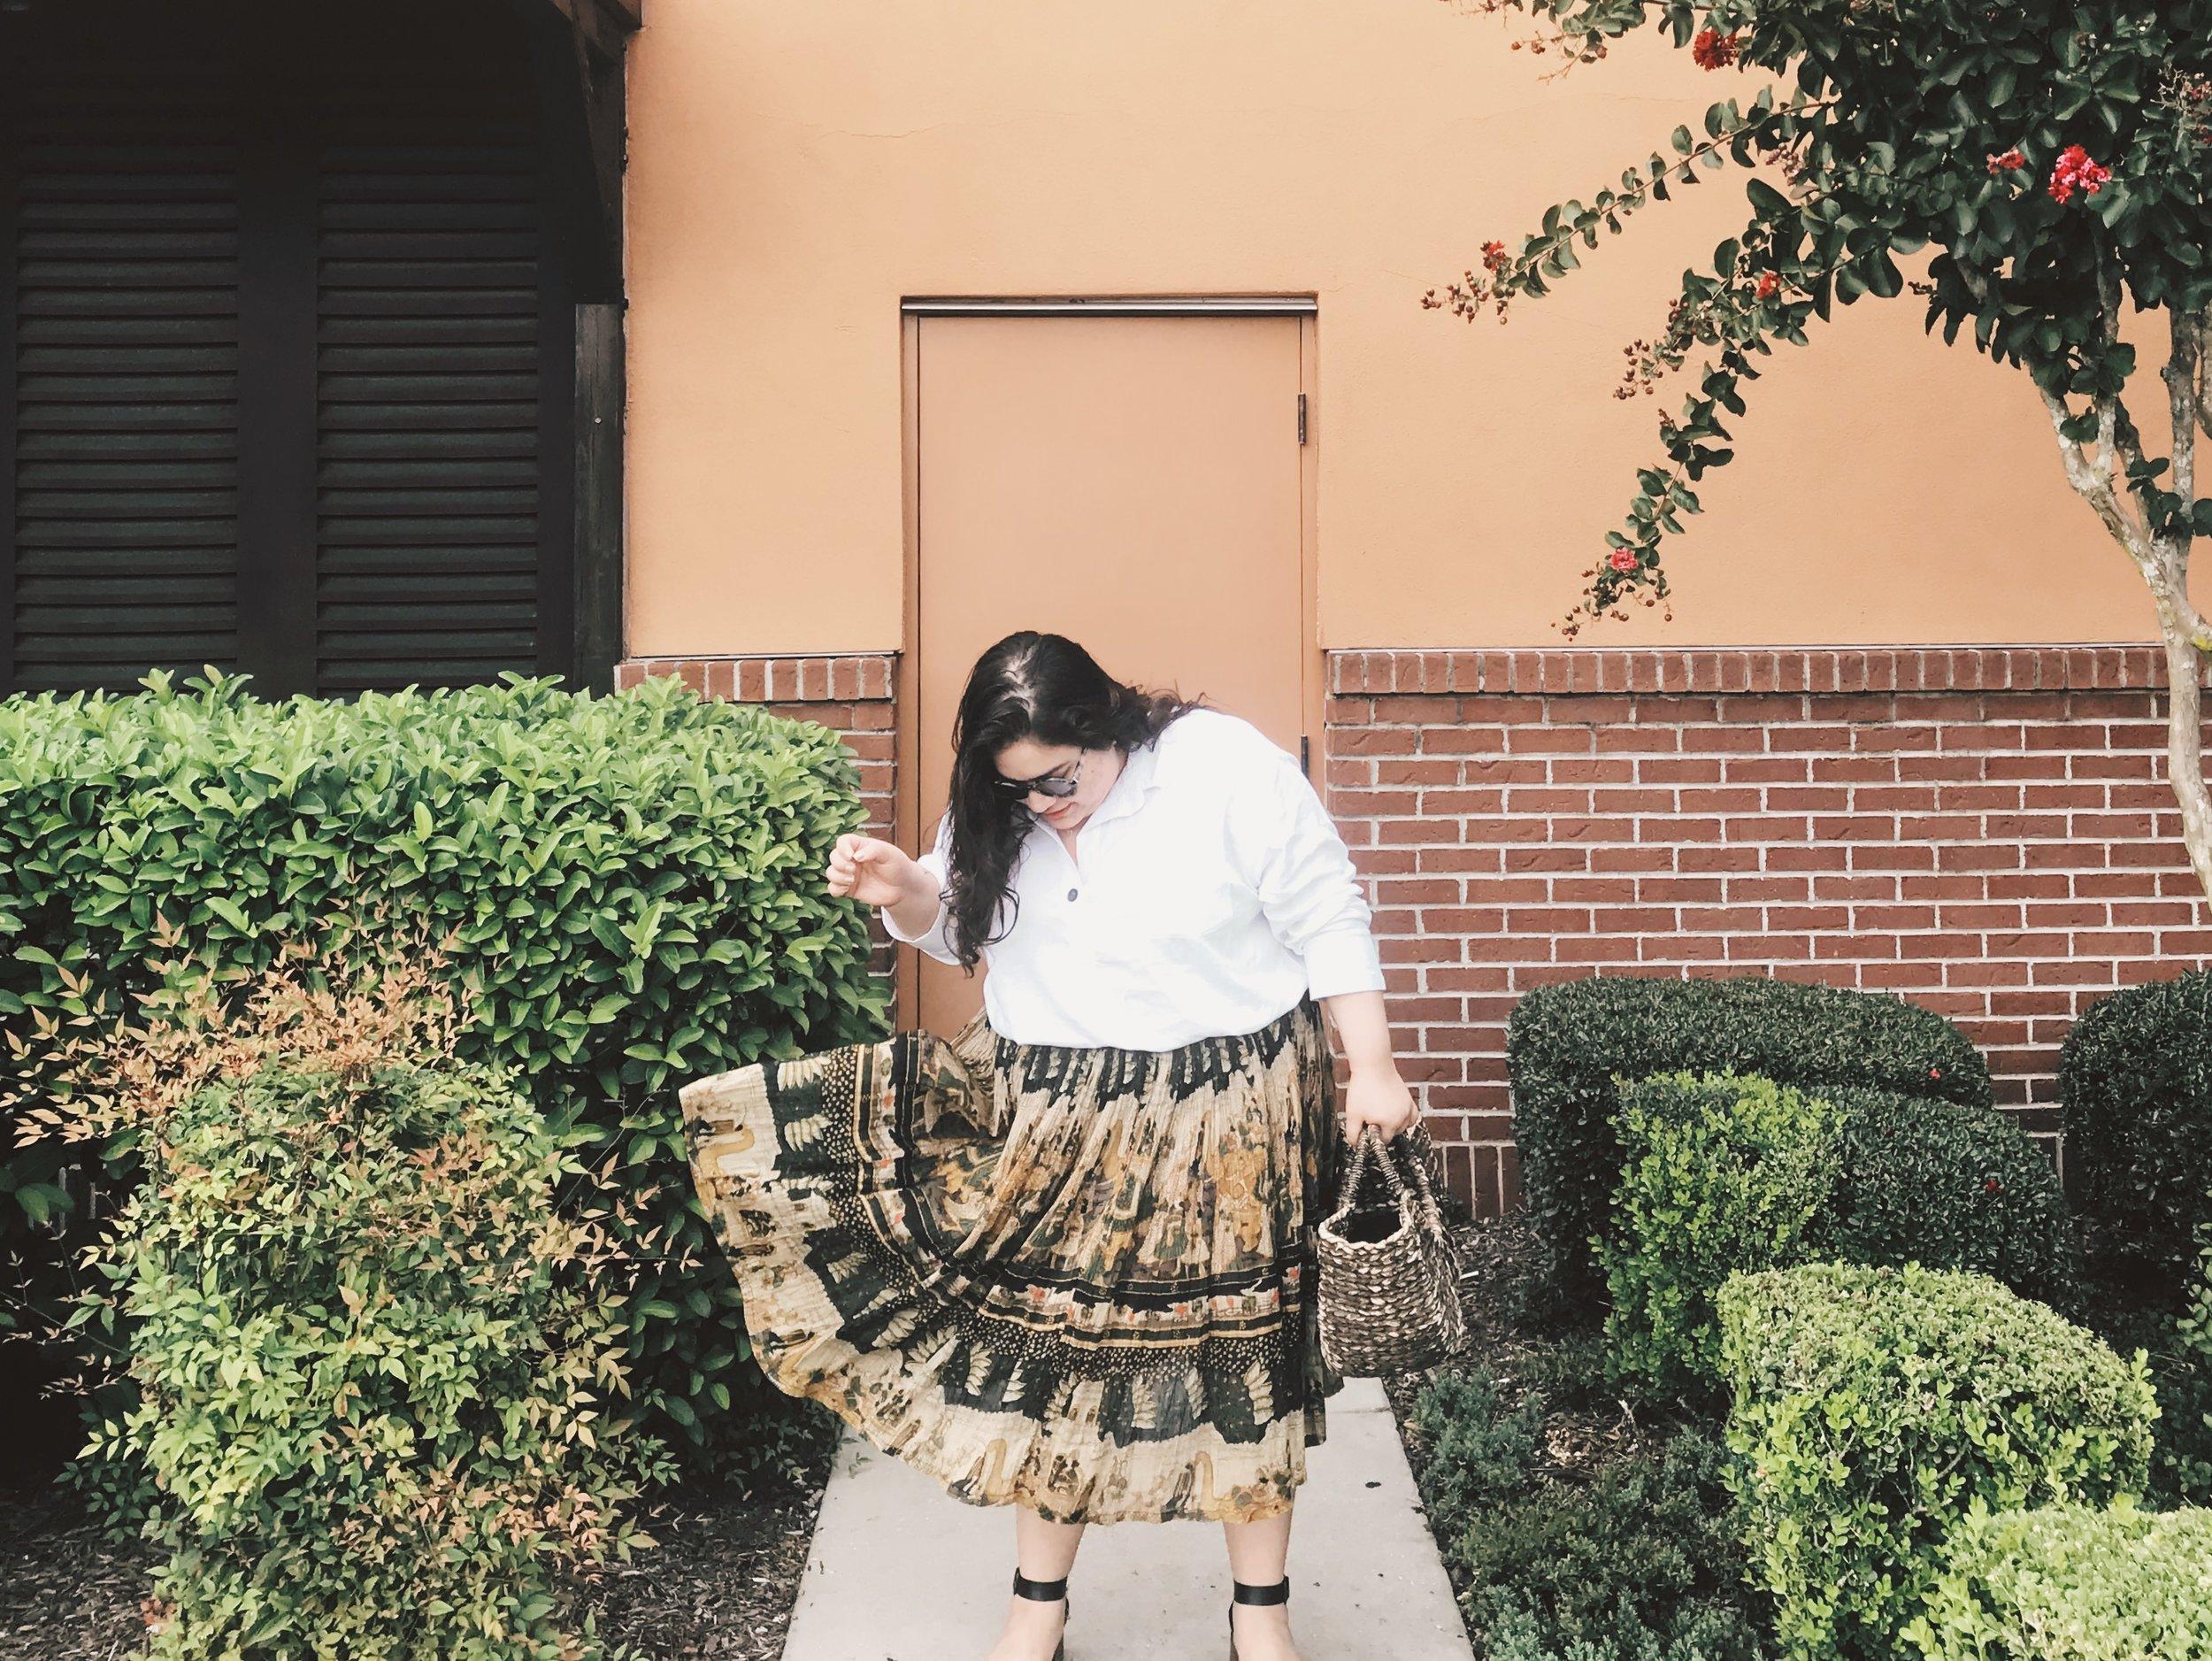 Raquel Reyes The Attic On Eighth Costalegre Style 6.jpeg